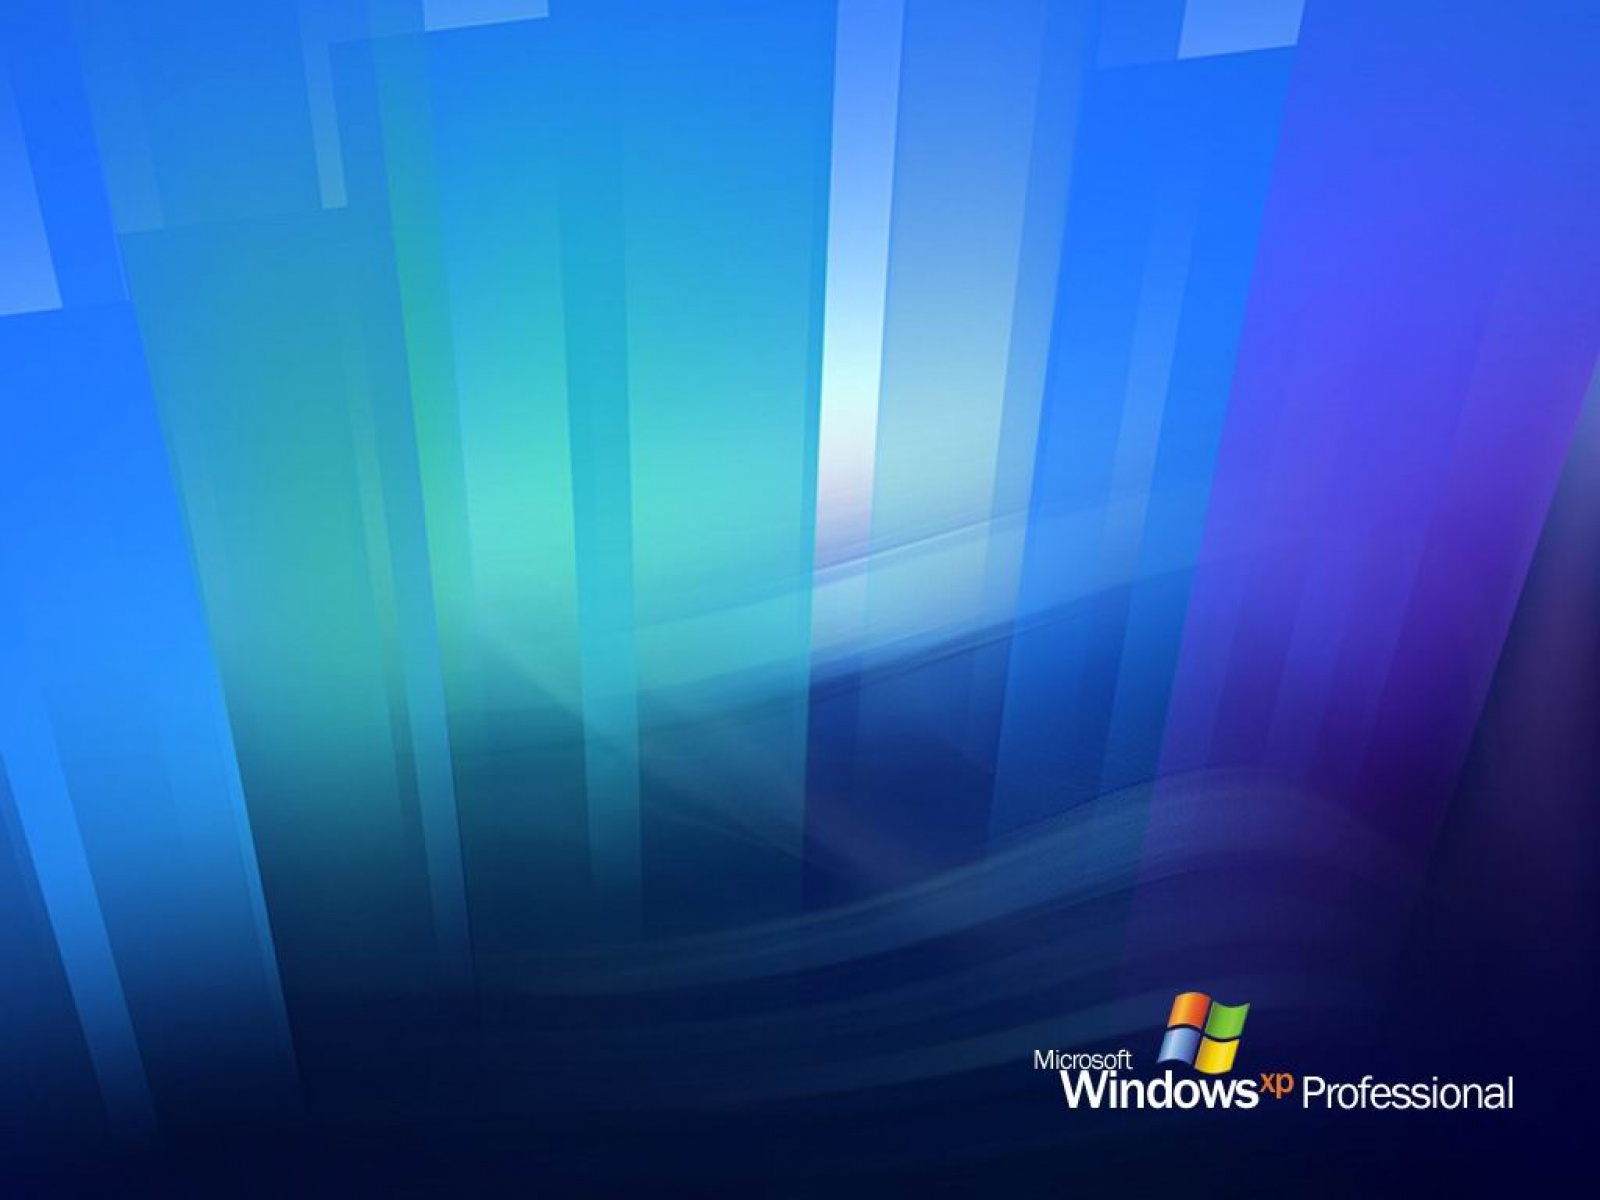 Windows xp pro wallpaper wallpapersafari windows xp professionalwallpapers78331600x1200g sciox Choice Image